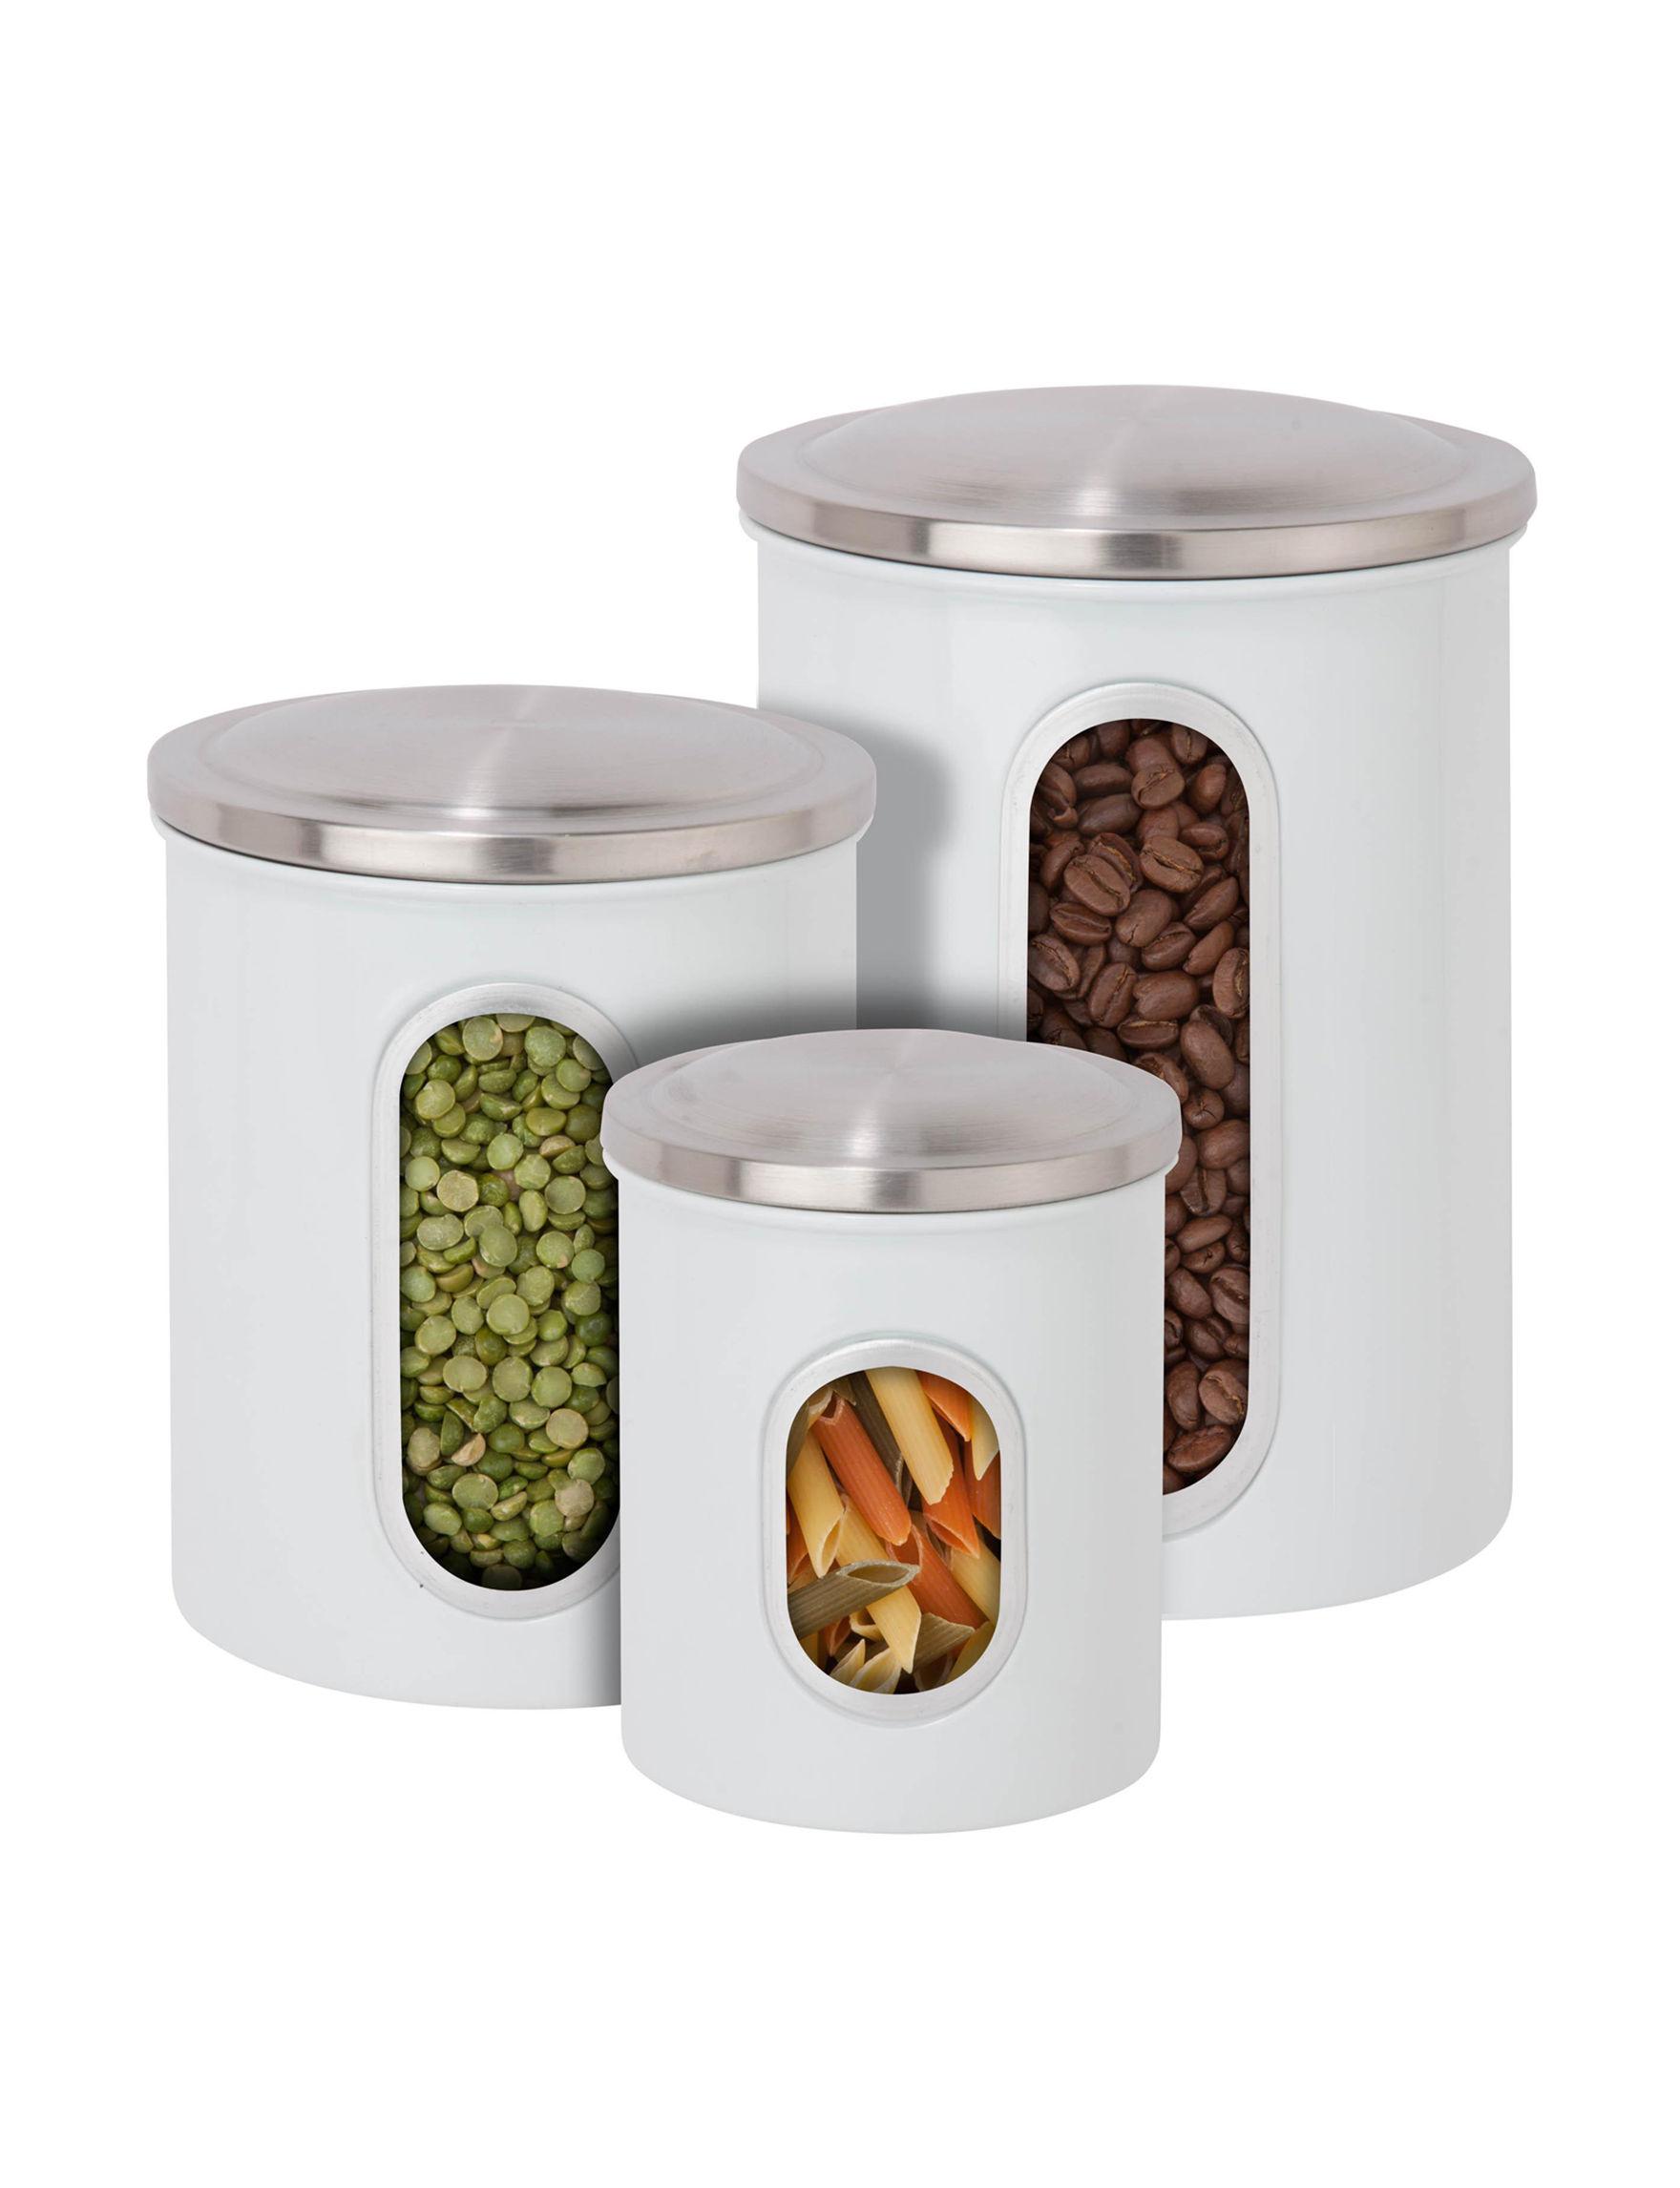 Honey-Can-Do International White Canister Sets Kitchen Storage & Organization